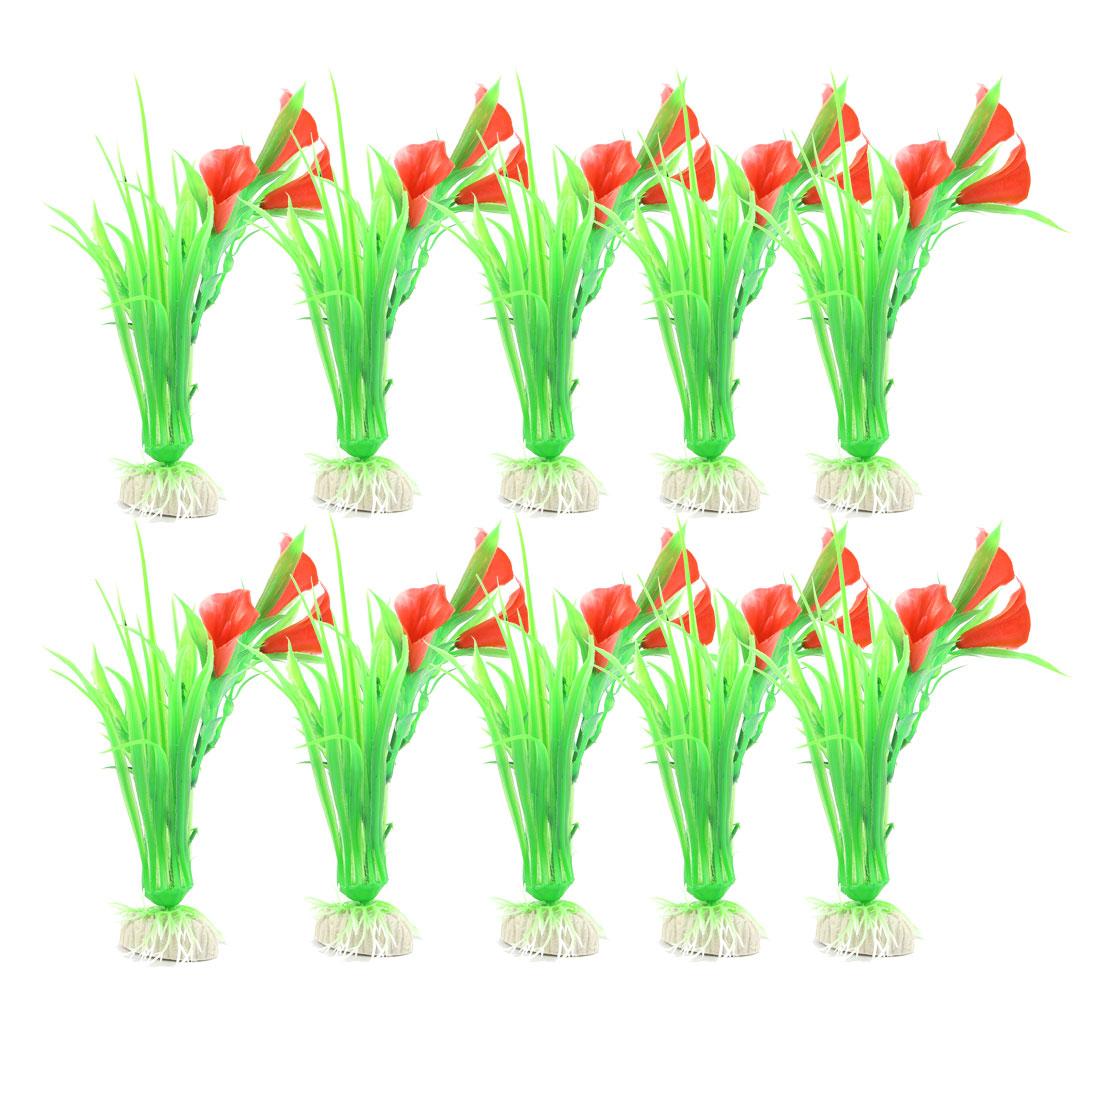 10Pcs Aquarium Flower Grass Ornament Plastic Fish Tank Plants